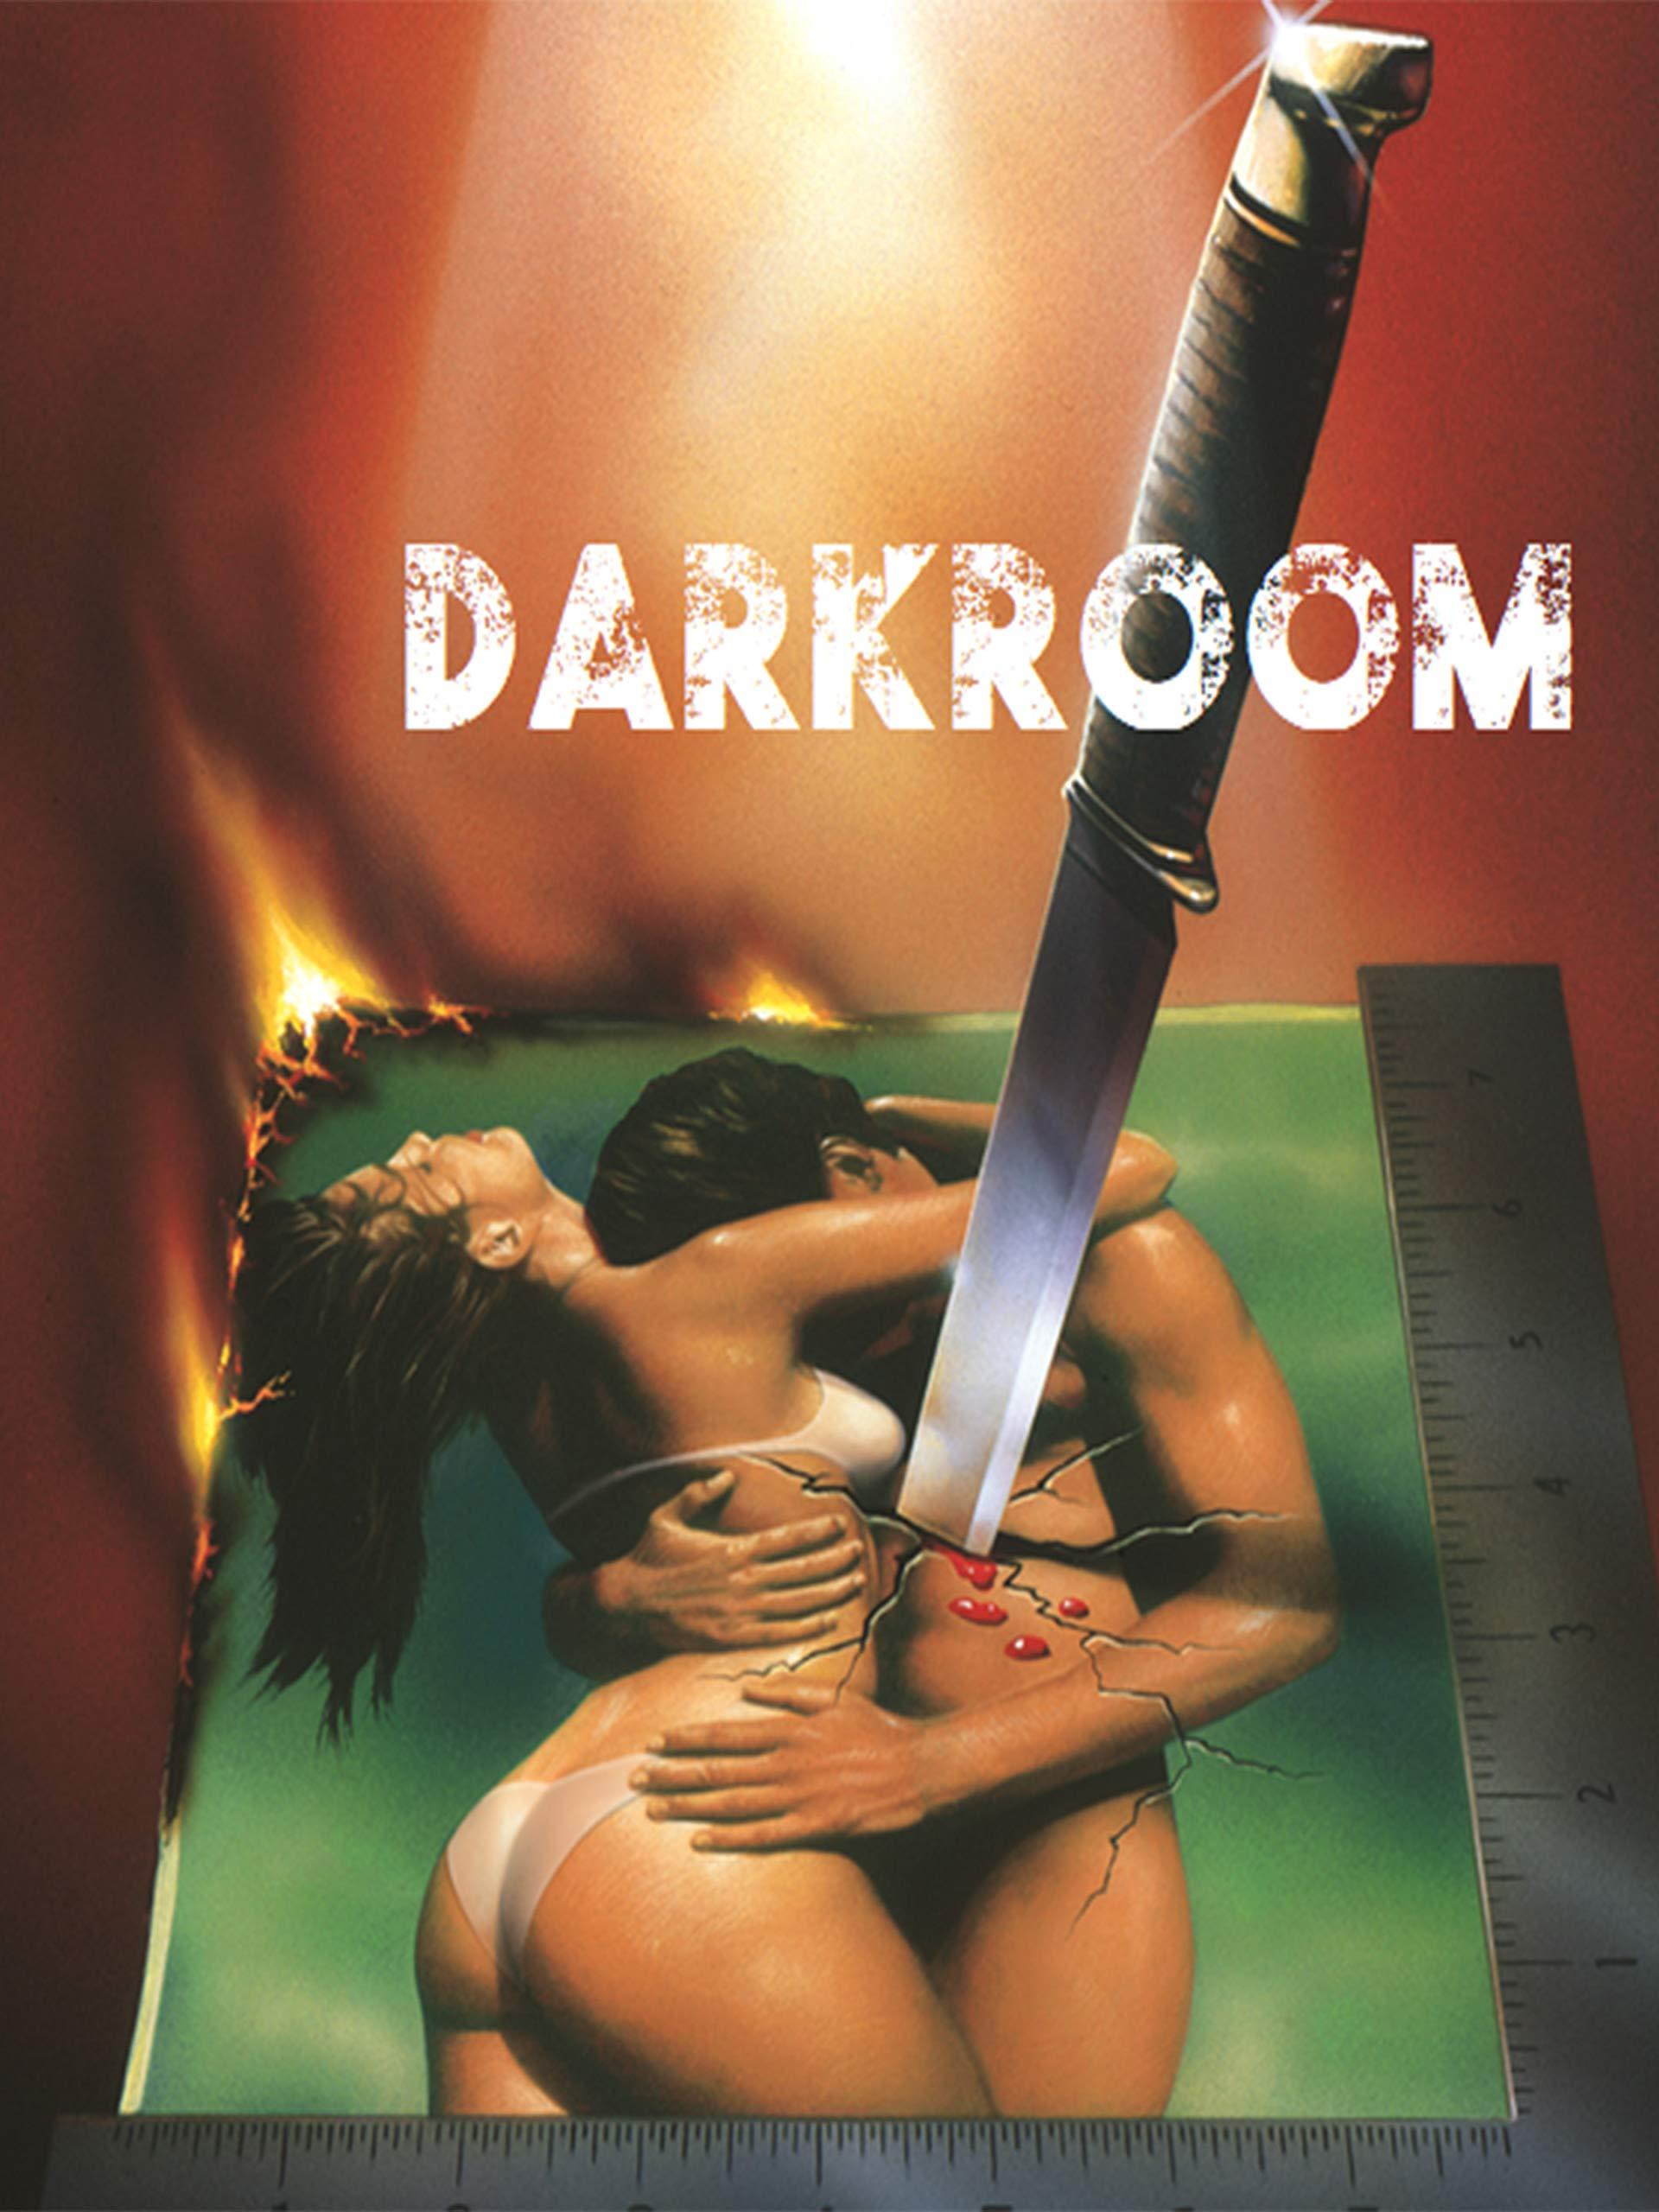 Darkroom on Amazon Prime Video UK